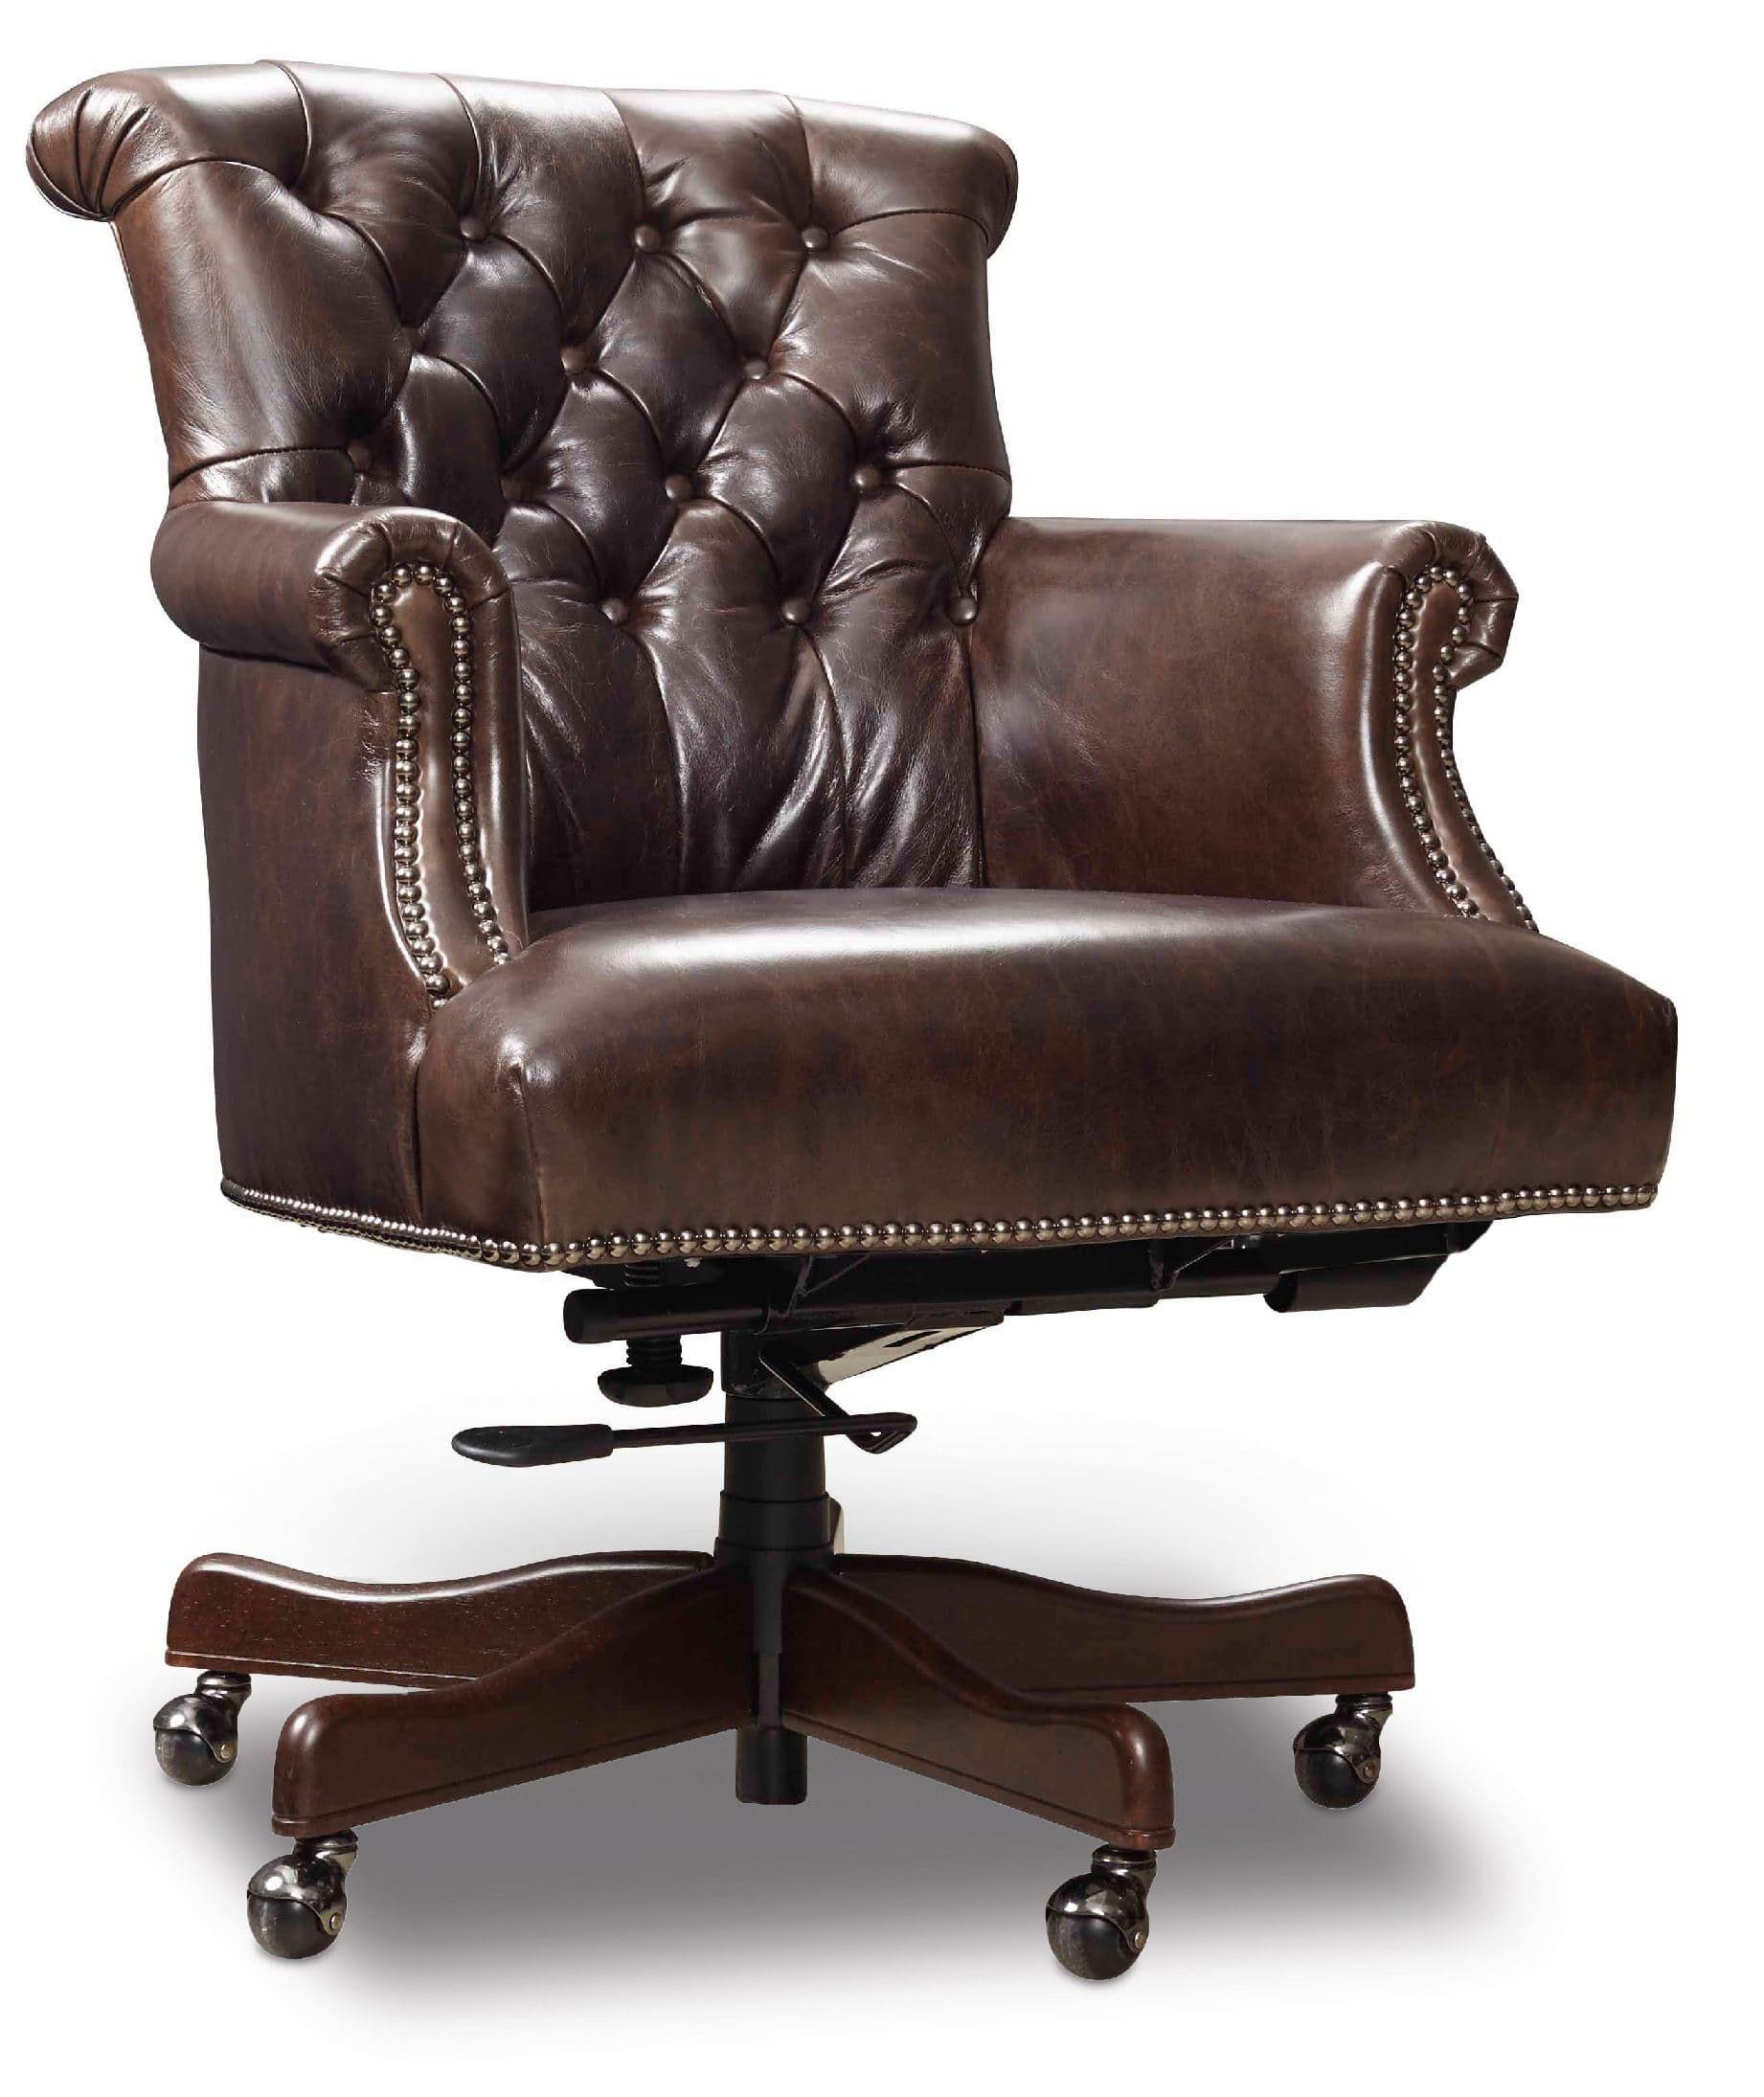 Putnam Home Office Chair EC474-088. 28W X 32.5D X 36.5H